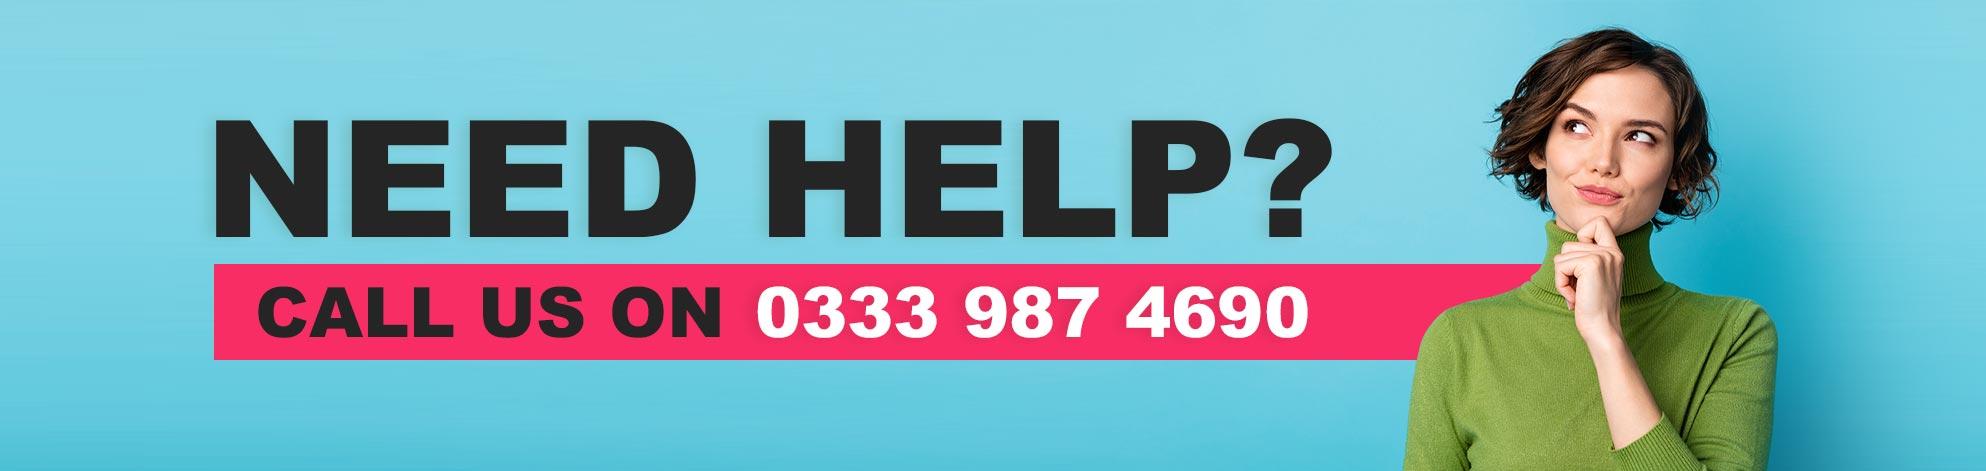 Need Help? Call Aquatiere